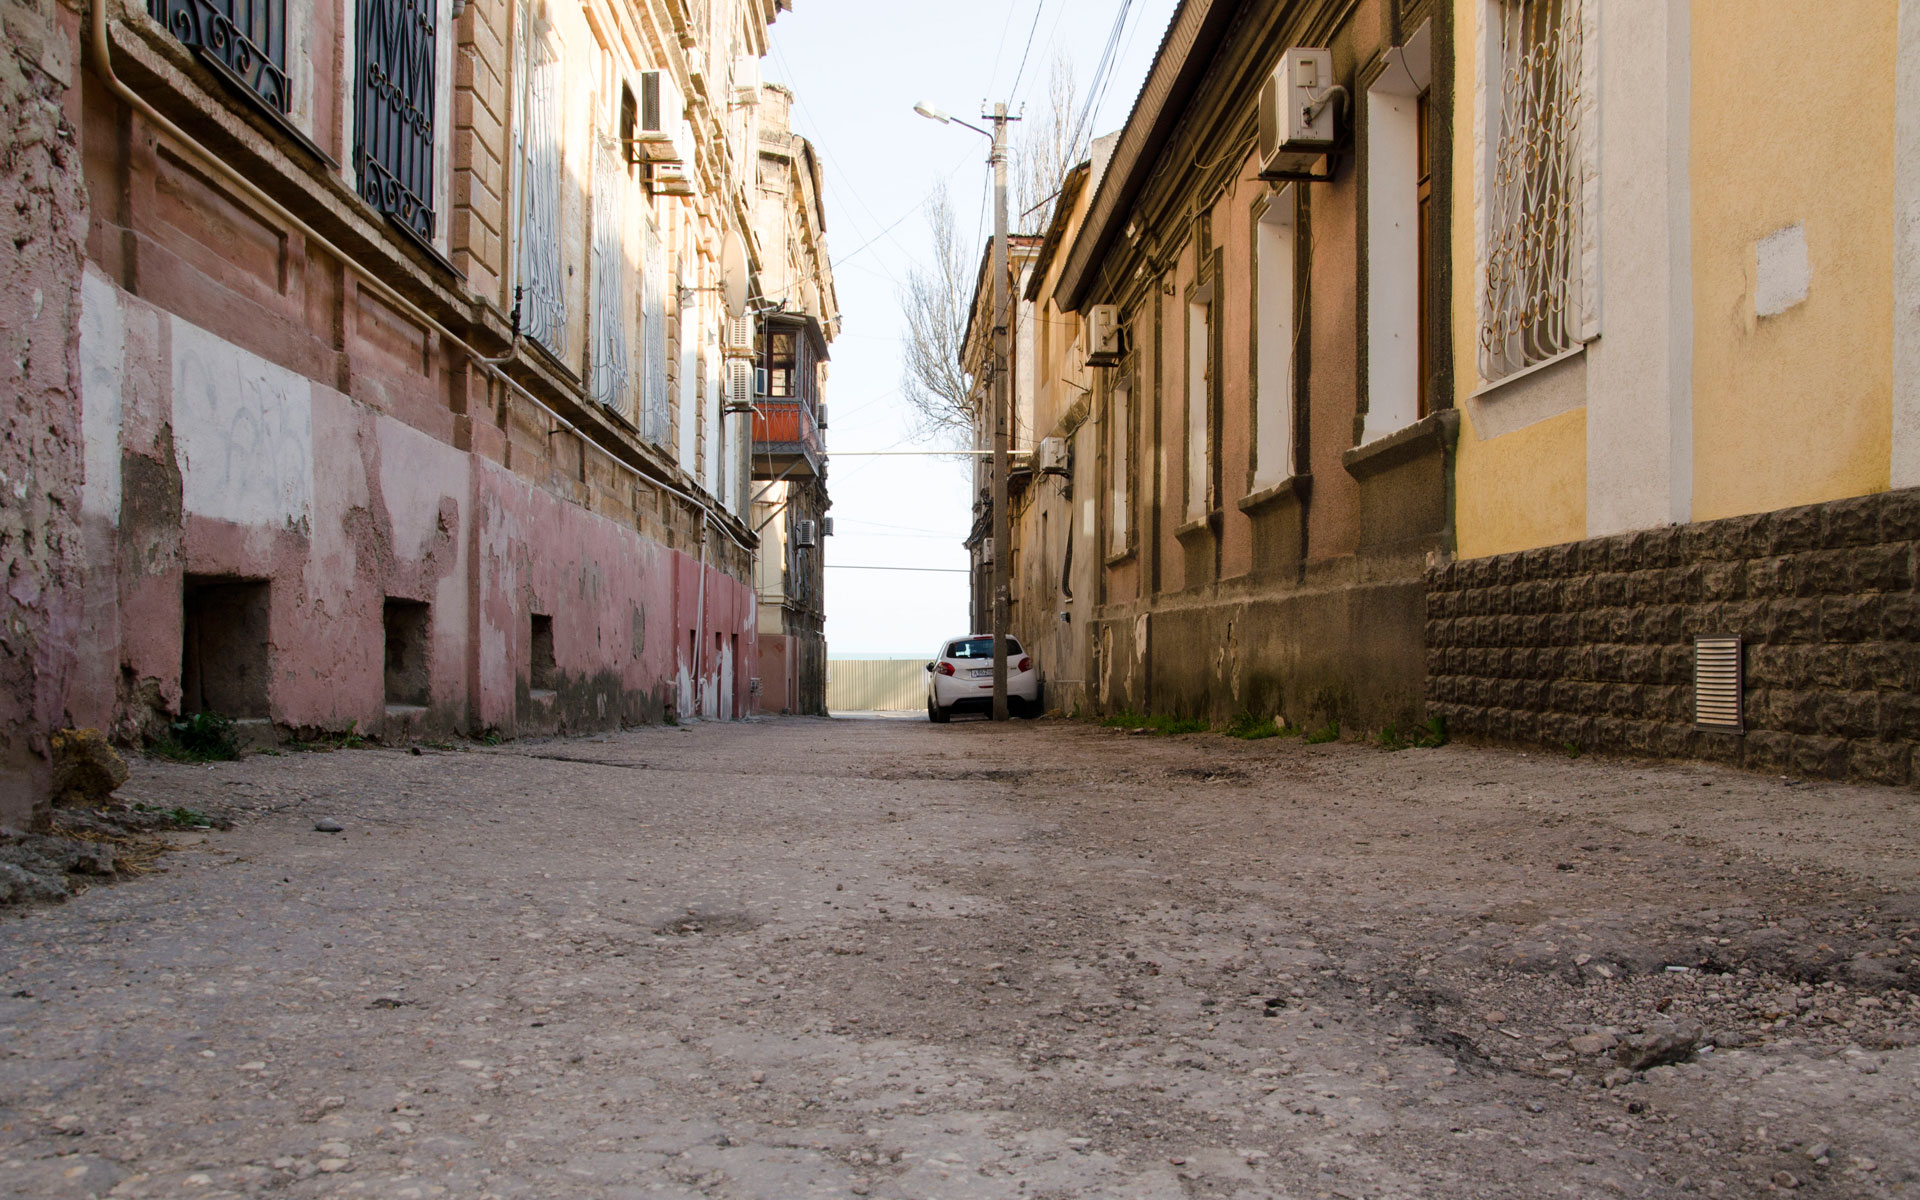 Старый проулок в марте. Фото Евпатории